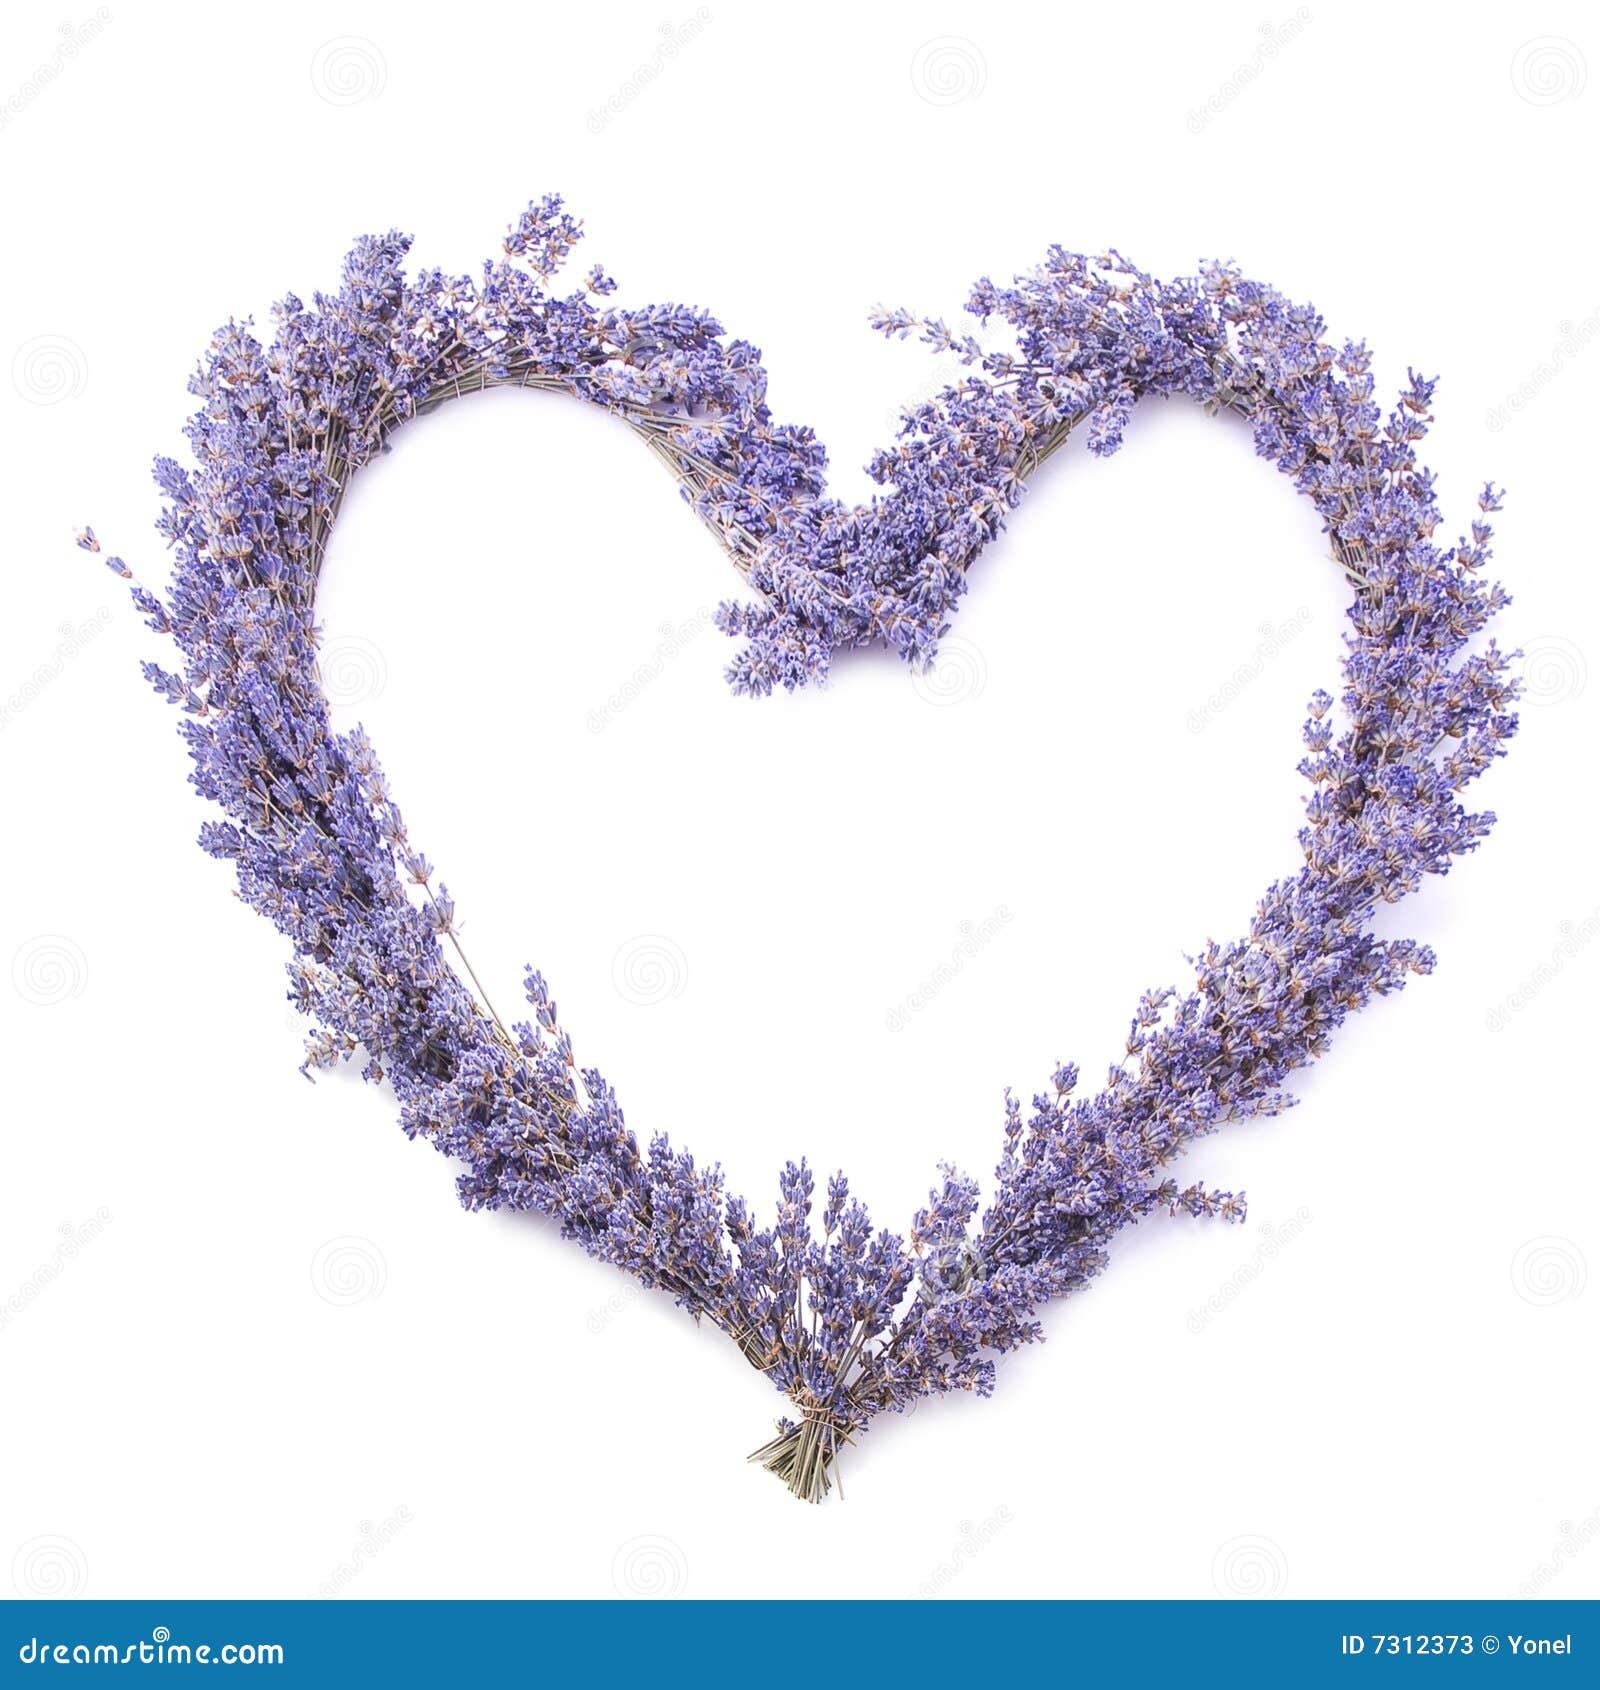 Lavender heart on white background (gift, valentine, etc.).